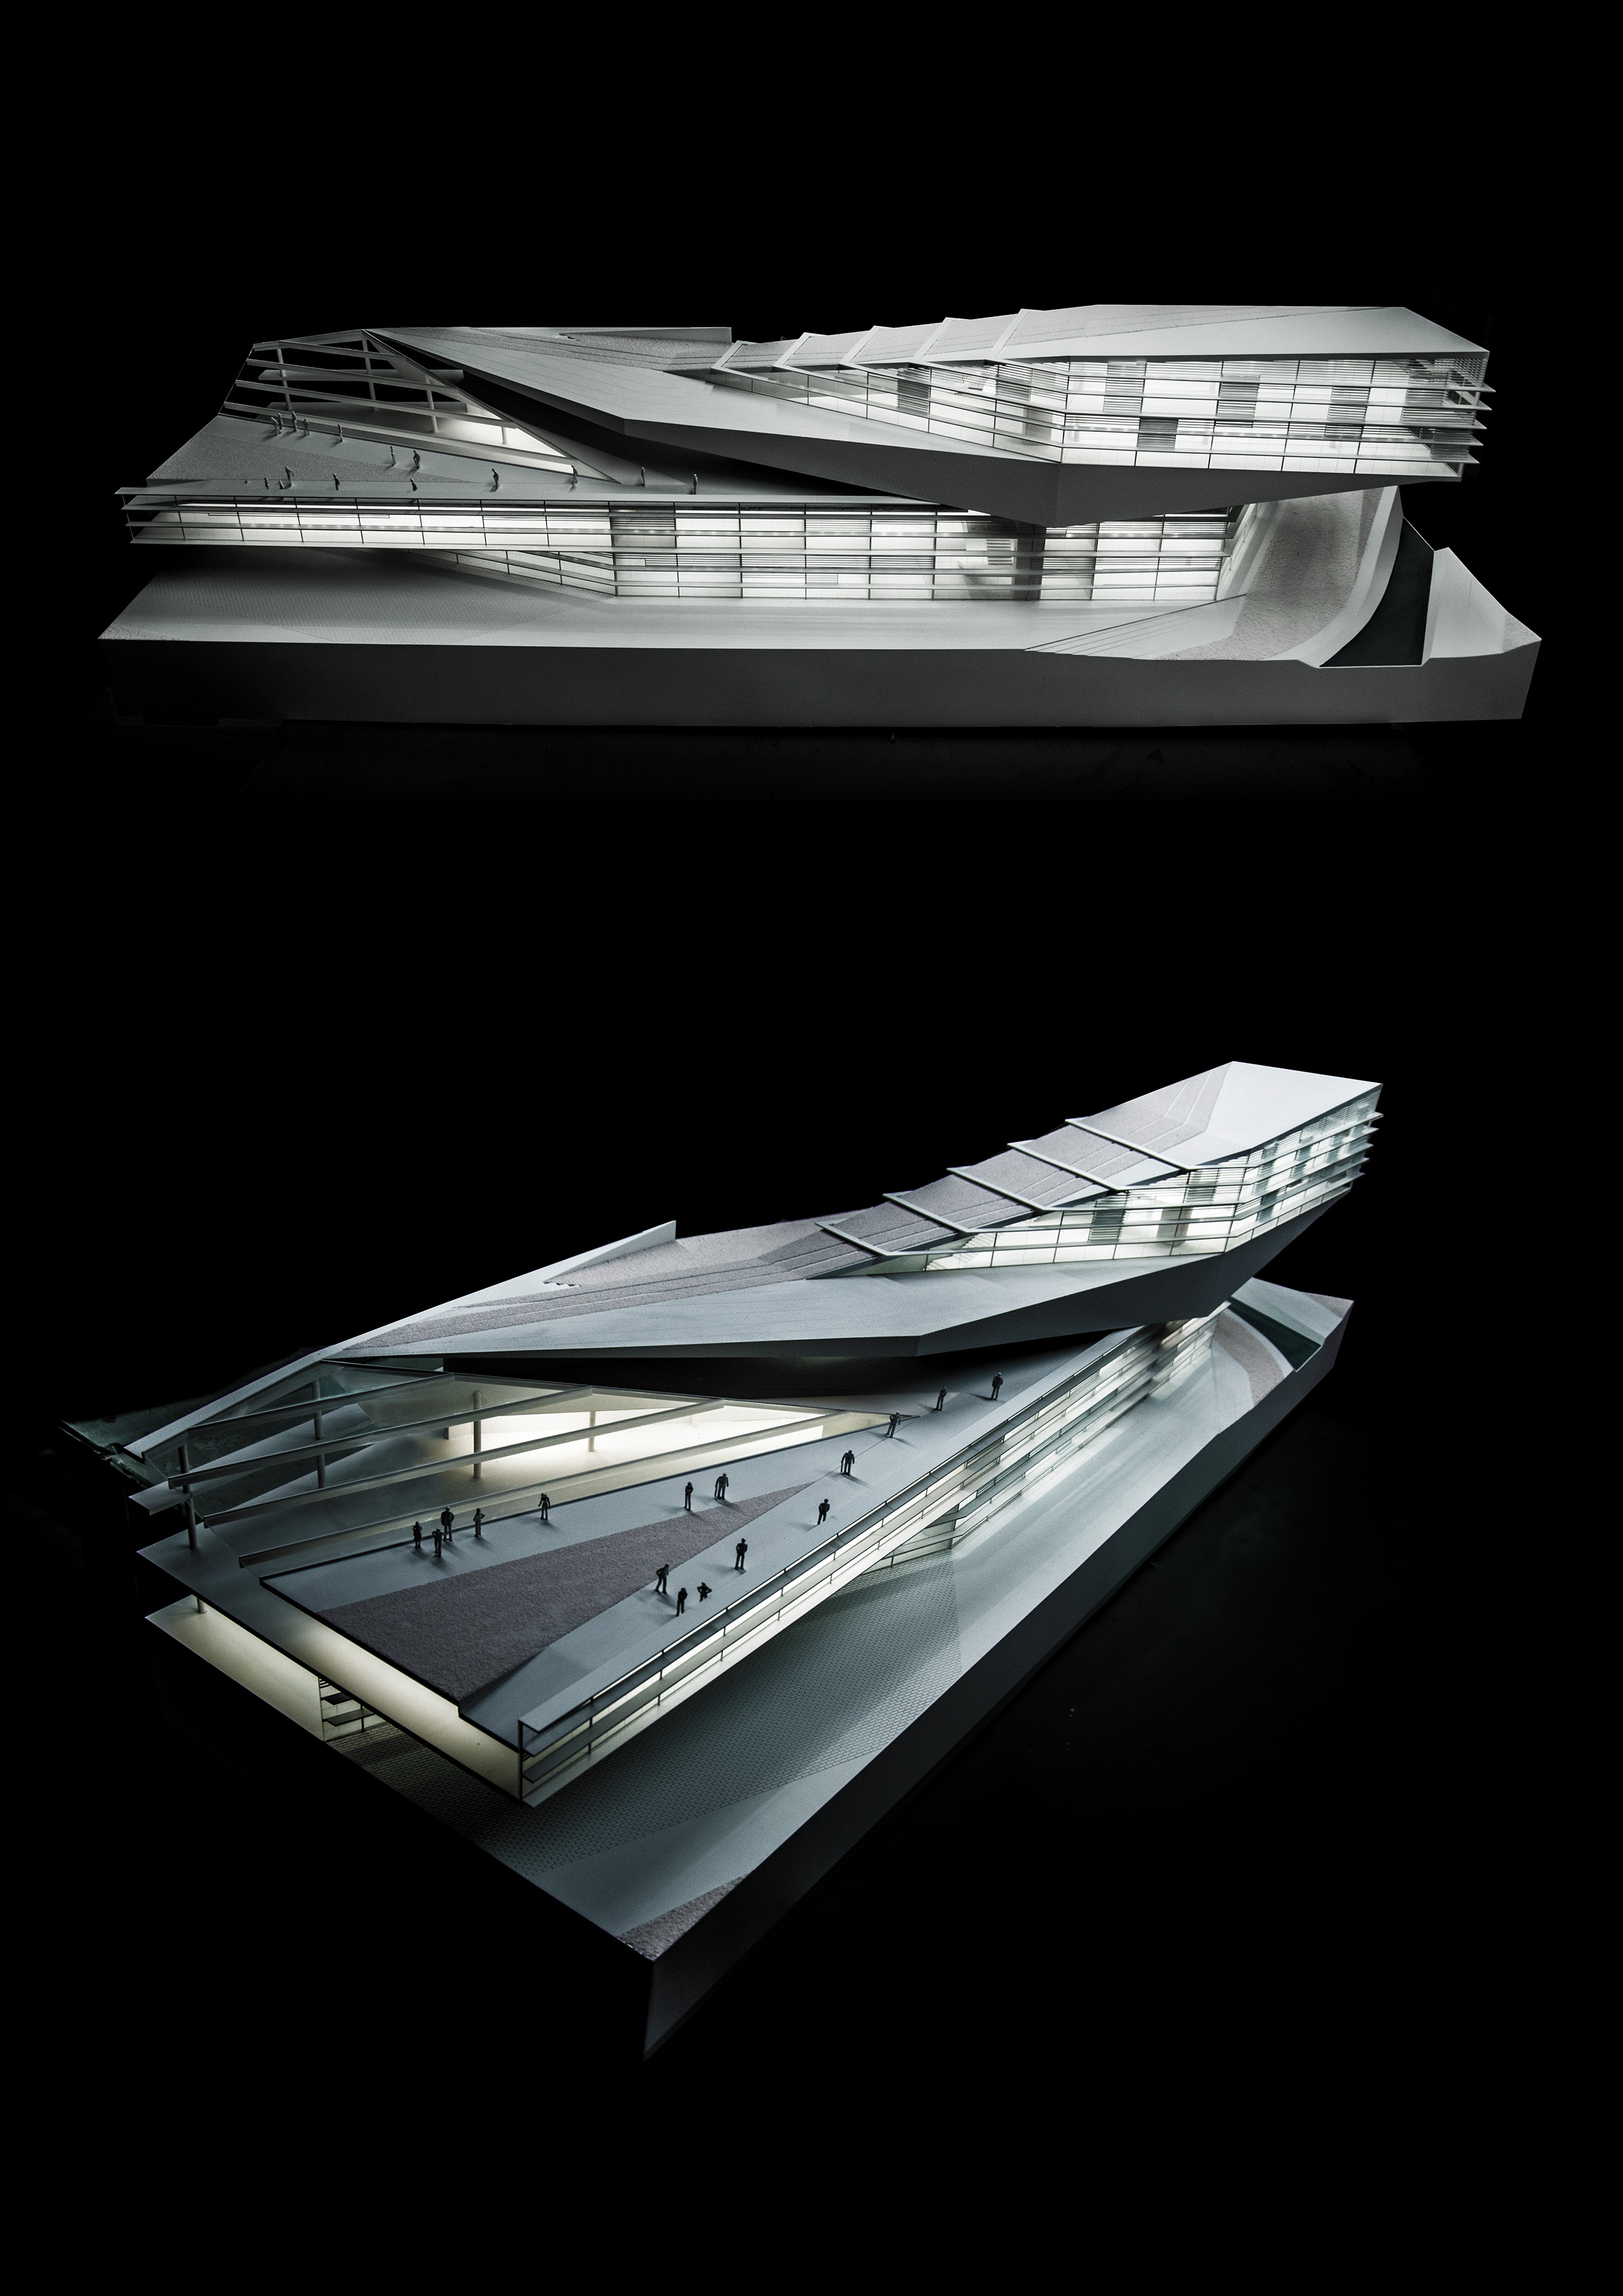 Izmir university Model,Plasma studio